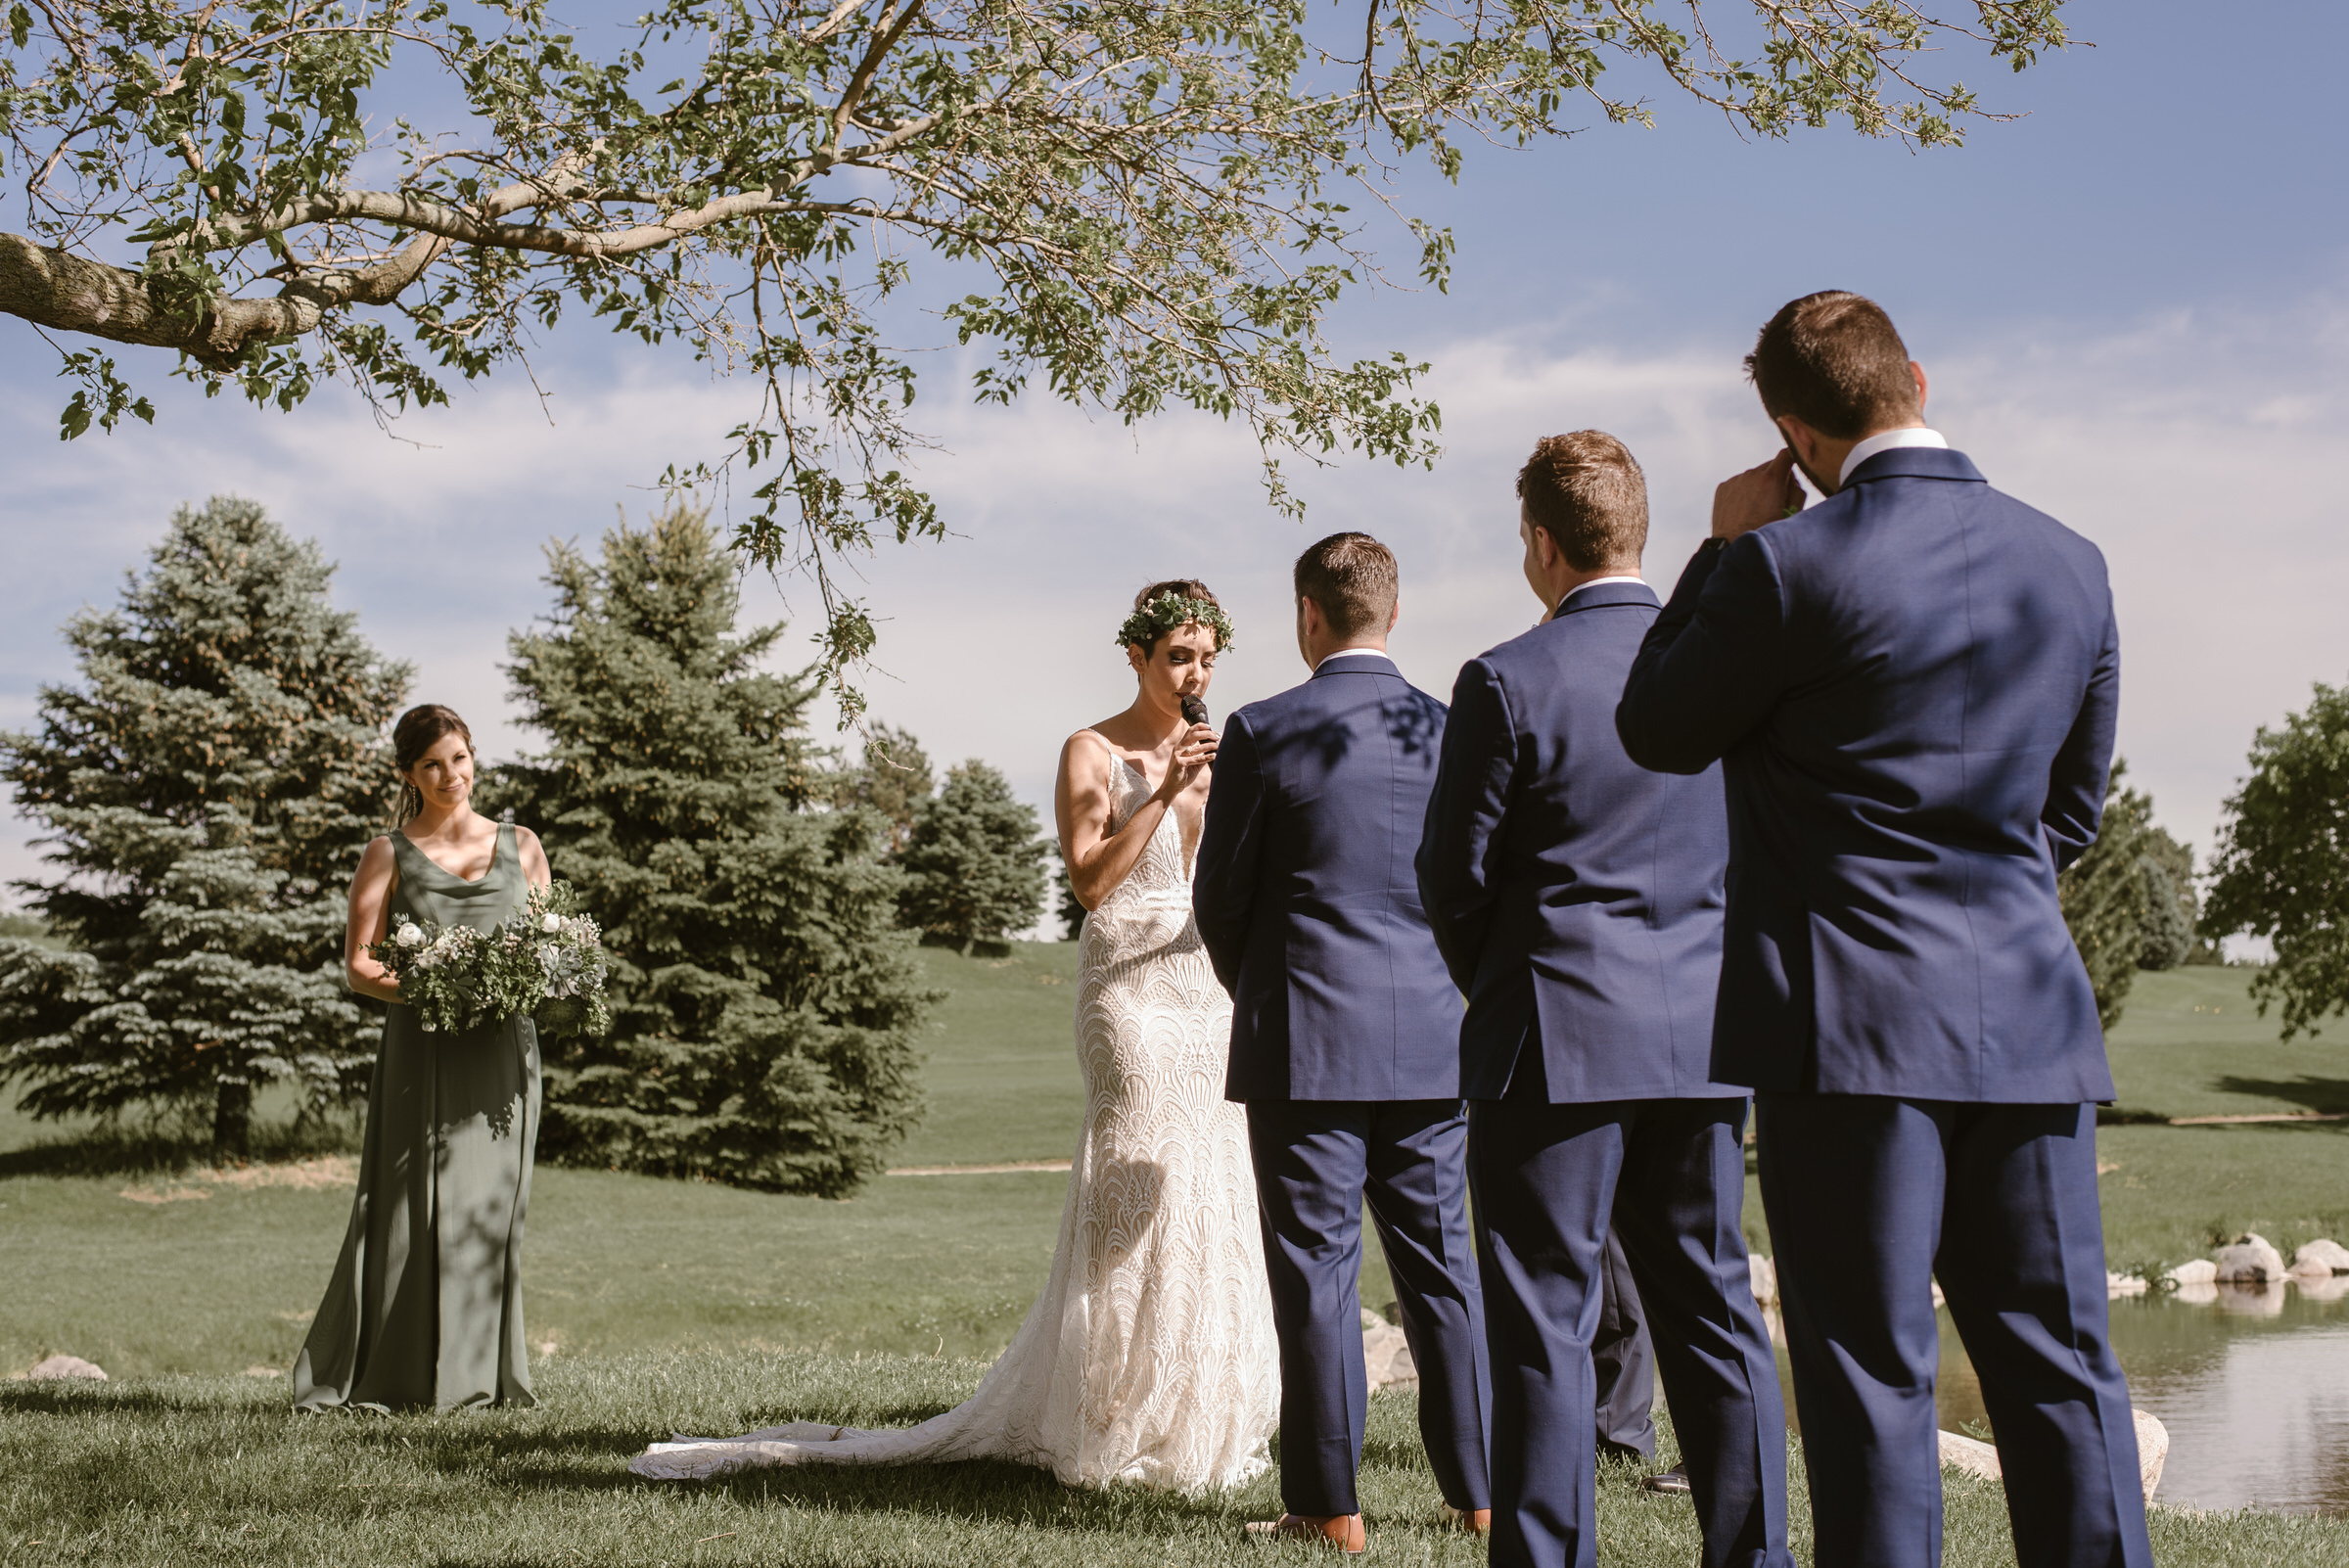 Wilderness-Ridge-Lincoln-Nebraska-Wedding-Kaylie-Sirek-Photography-056.jpg